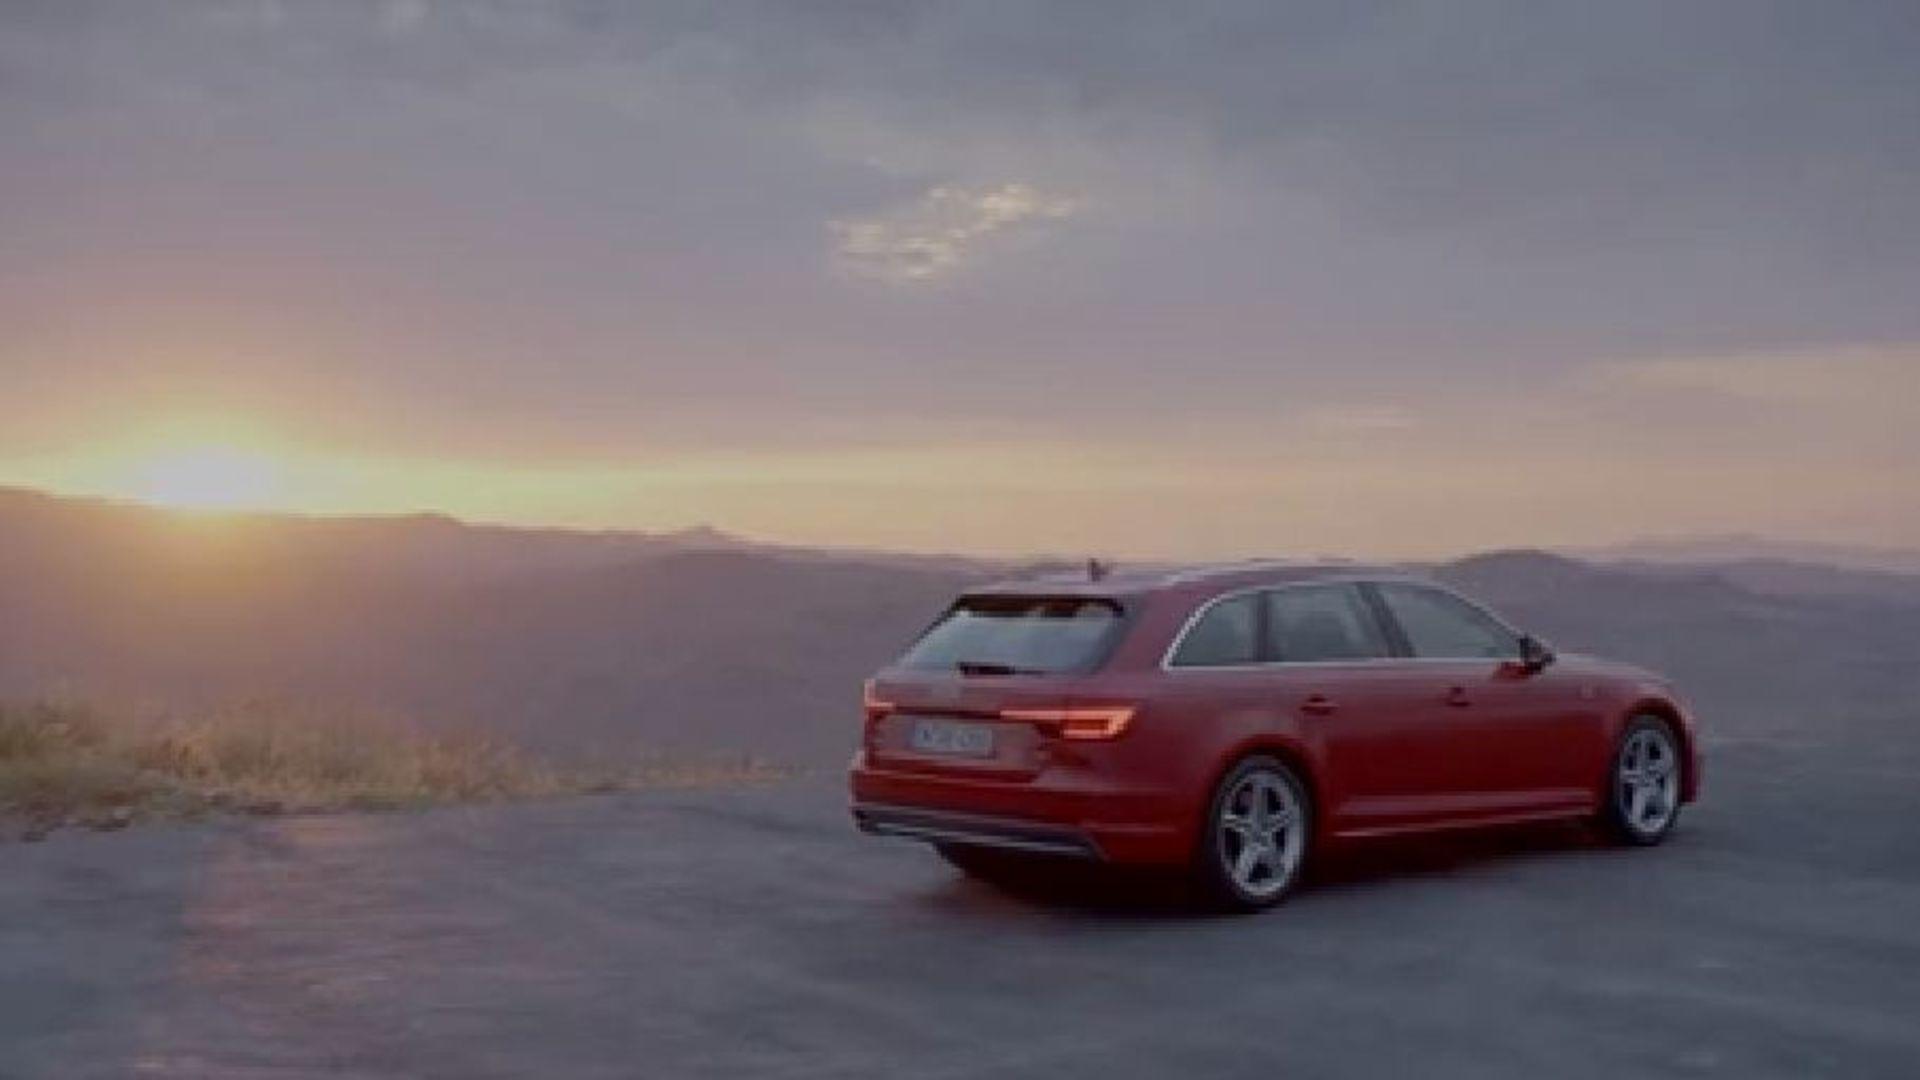 Audi A4 (2015) Emotion Trailer - Normal